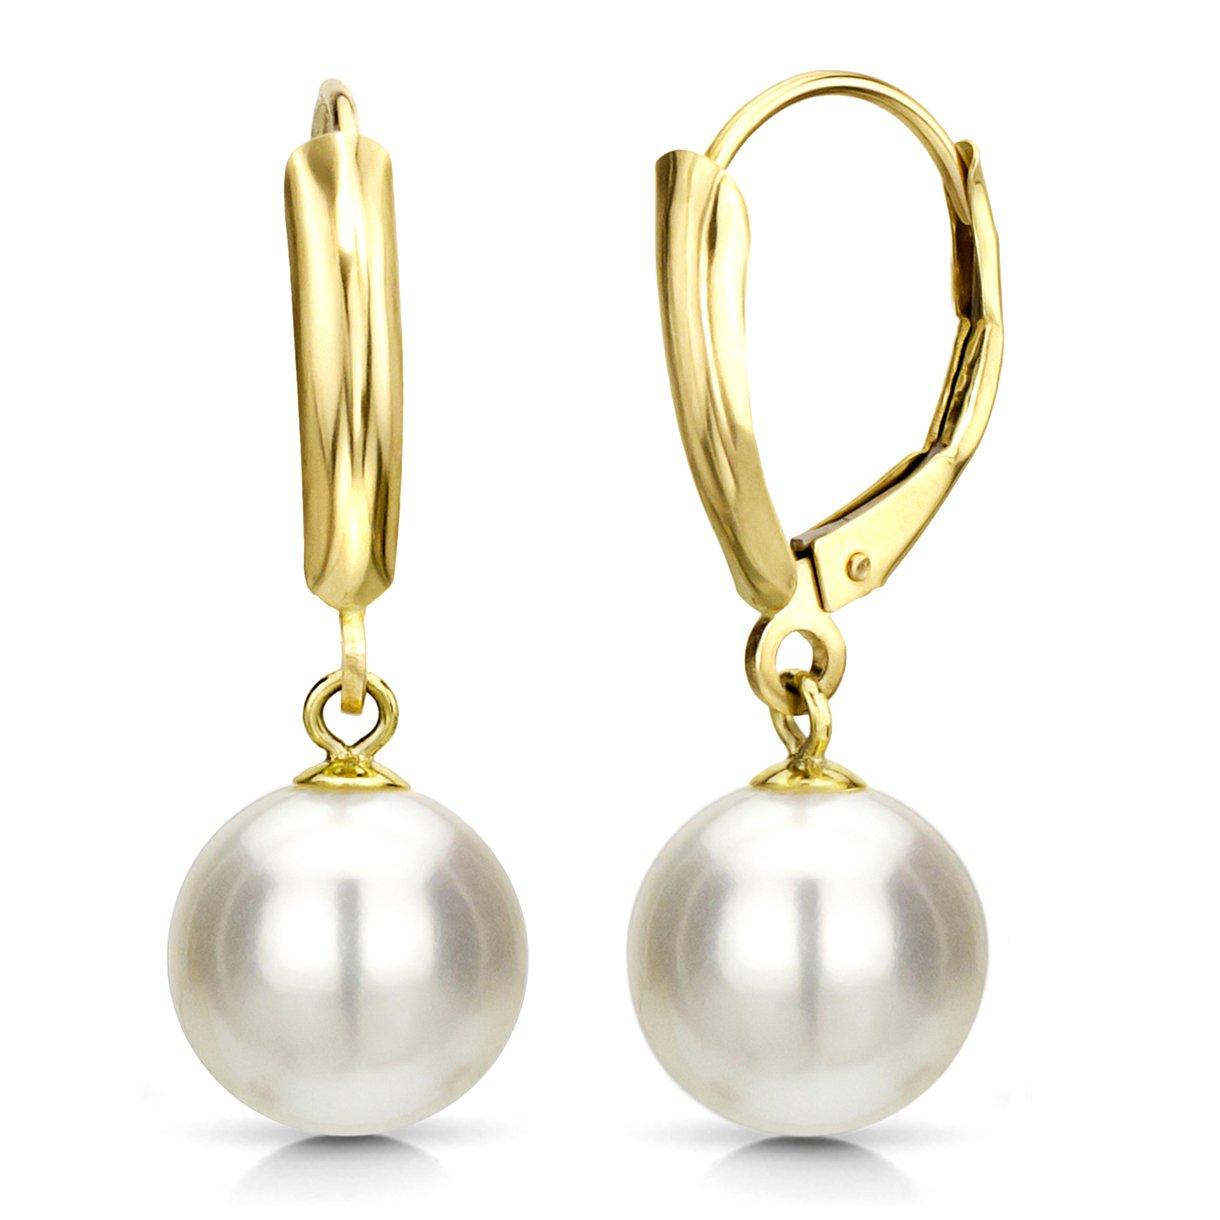 White Freshwater Cultured Pearl Earrings Dangle Leverback 14K Yellow Gold Wedding Gift 7-7.5mm by La Regis Jewelry (Image #1)